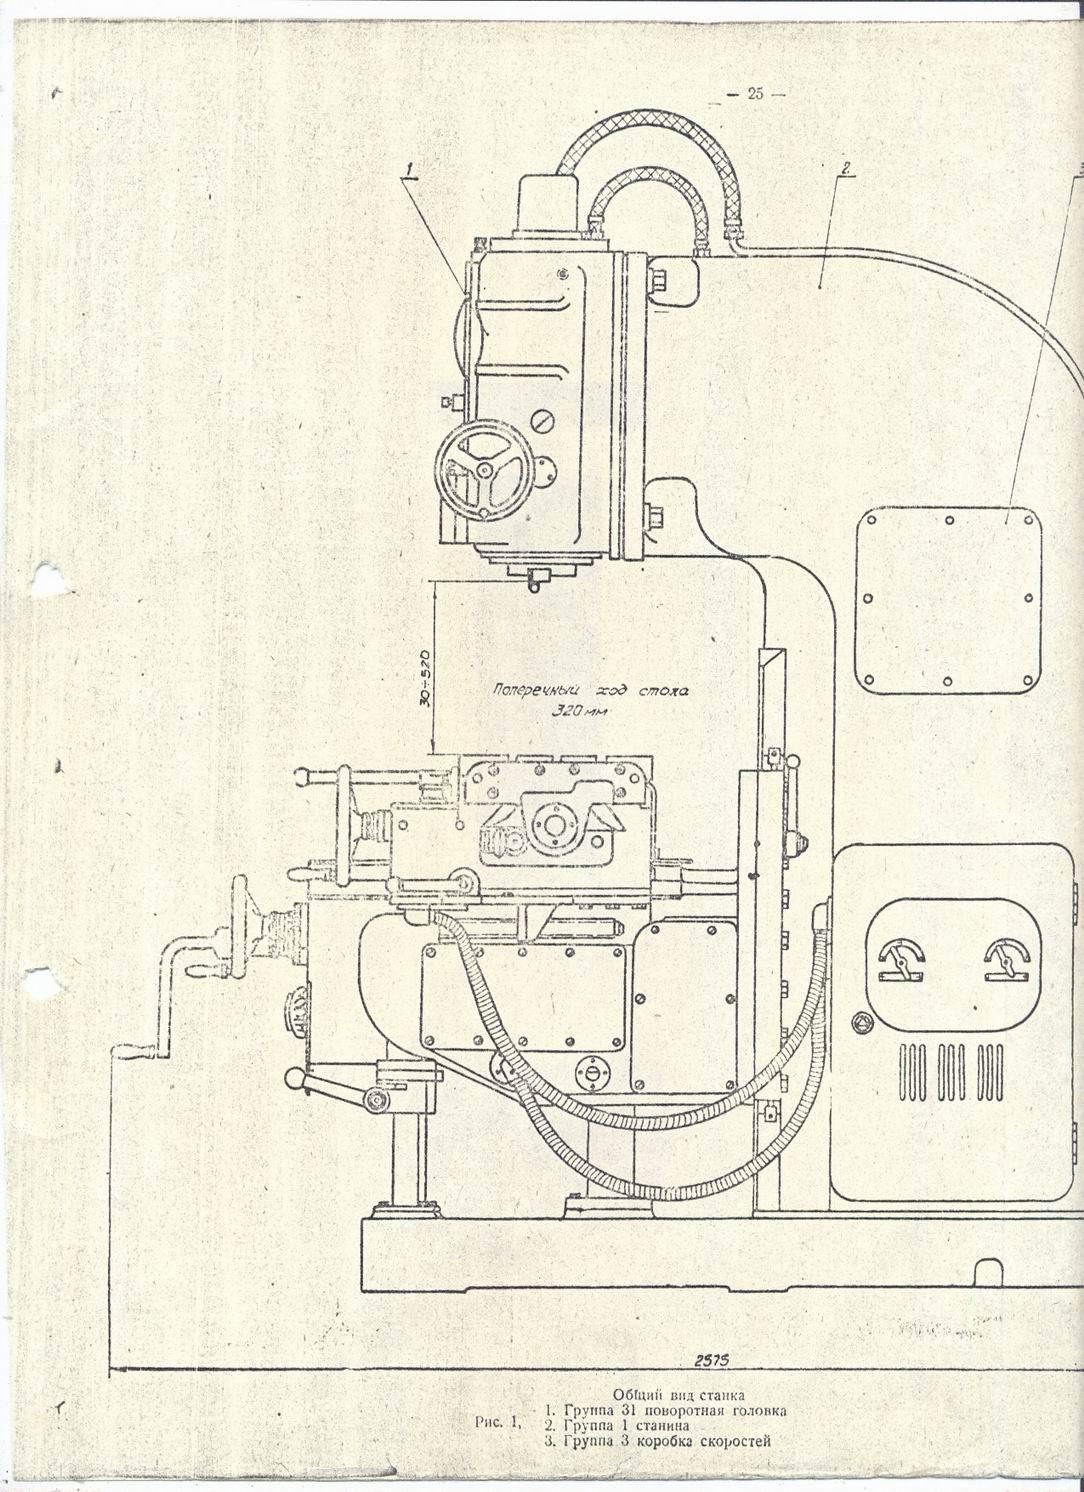 коробка подач монтажная схема